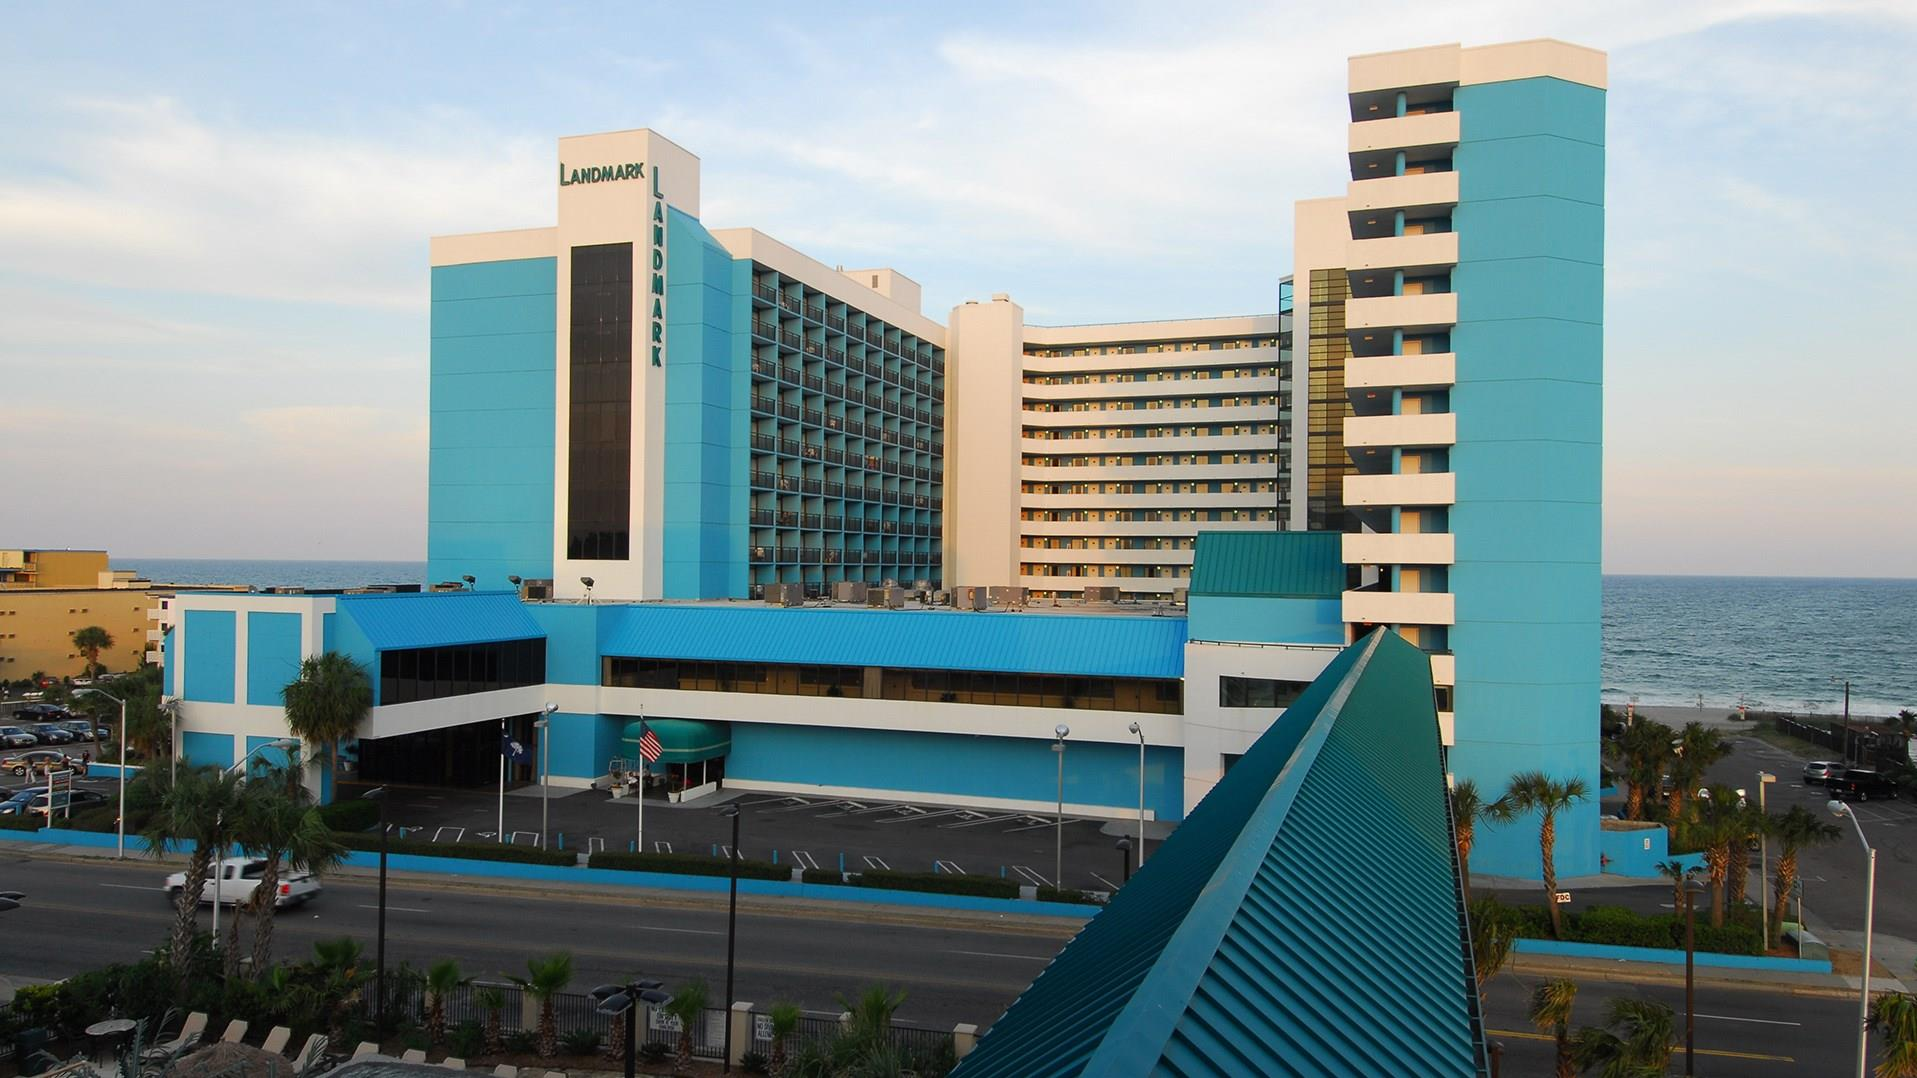 Hotels In Myrtle Beach Sc >> Meetings And Events At Landmark Resort Hotel Myrtle Beach Sc Us